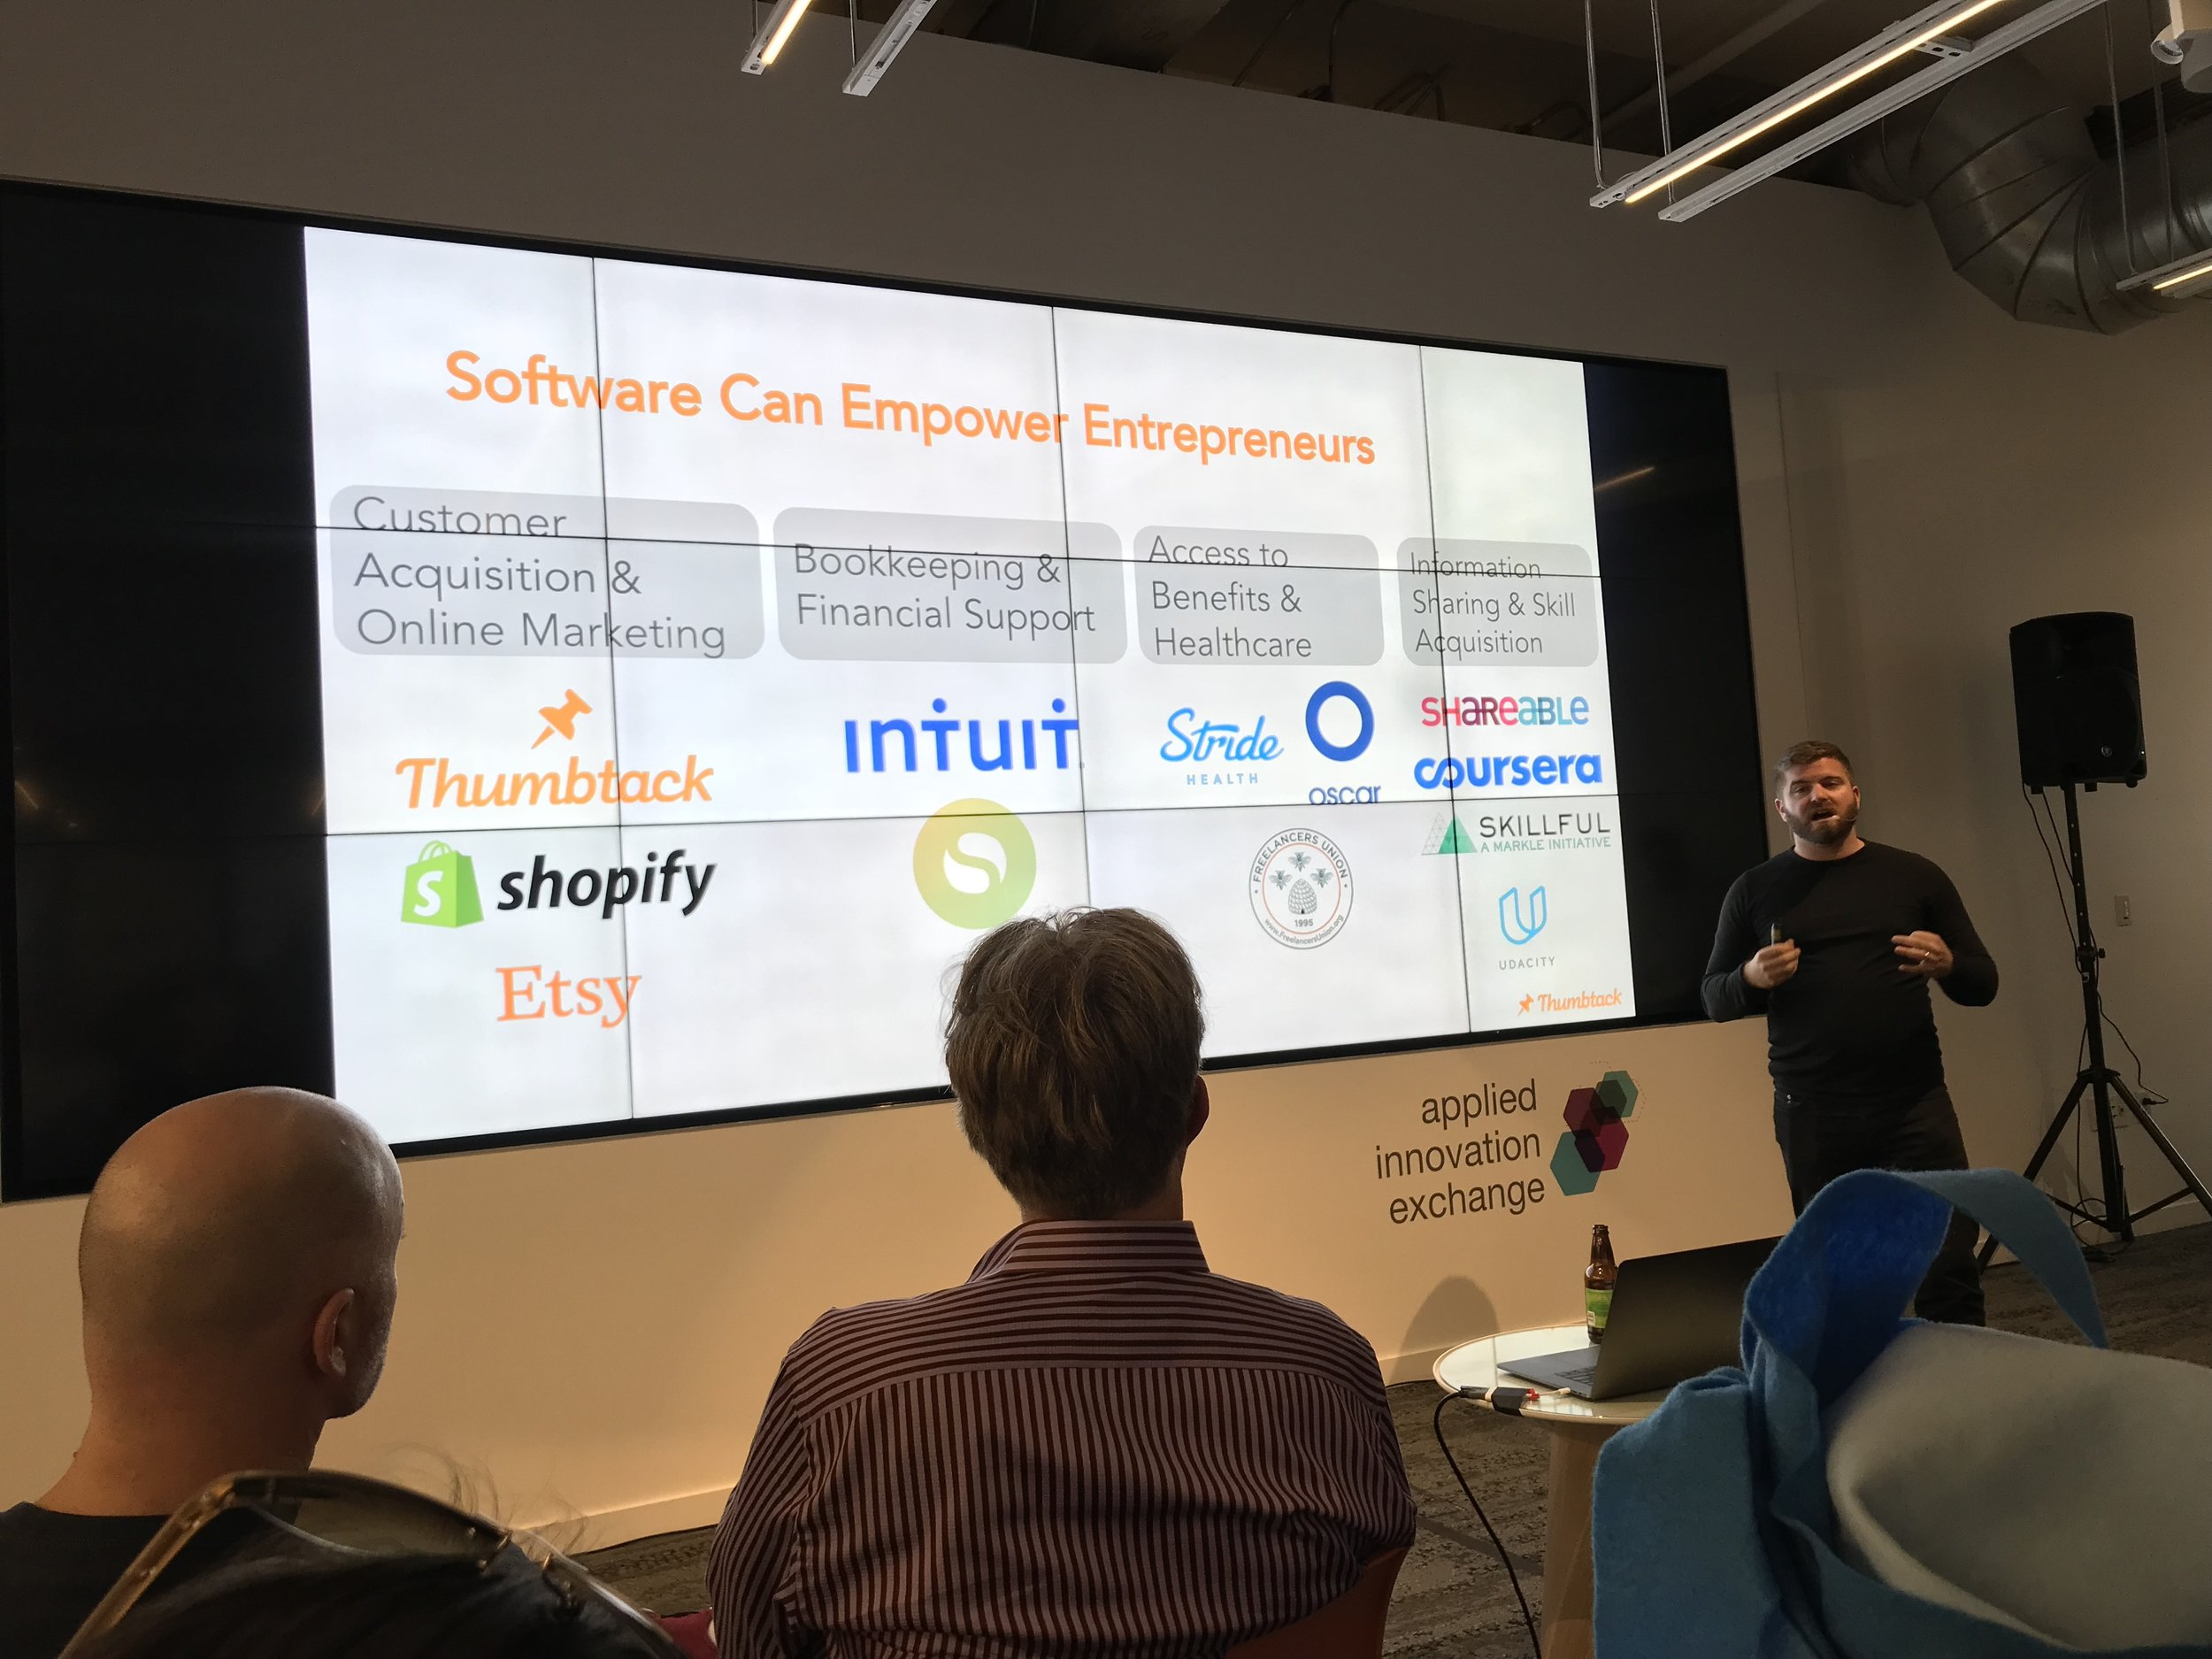 Thumbtack Software Can Empower Entrepreneurs.JPG